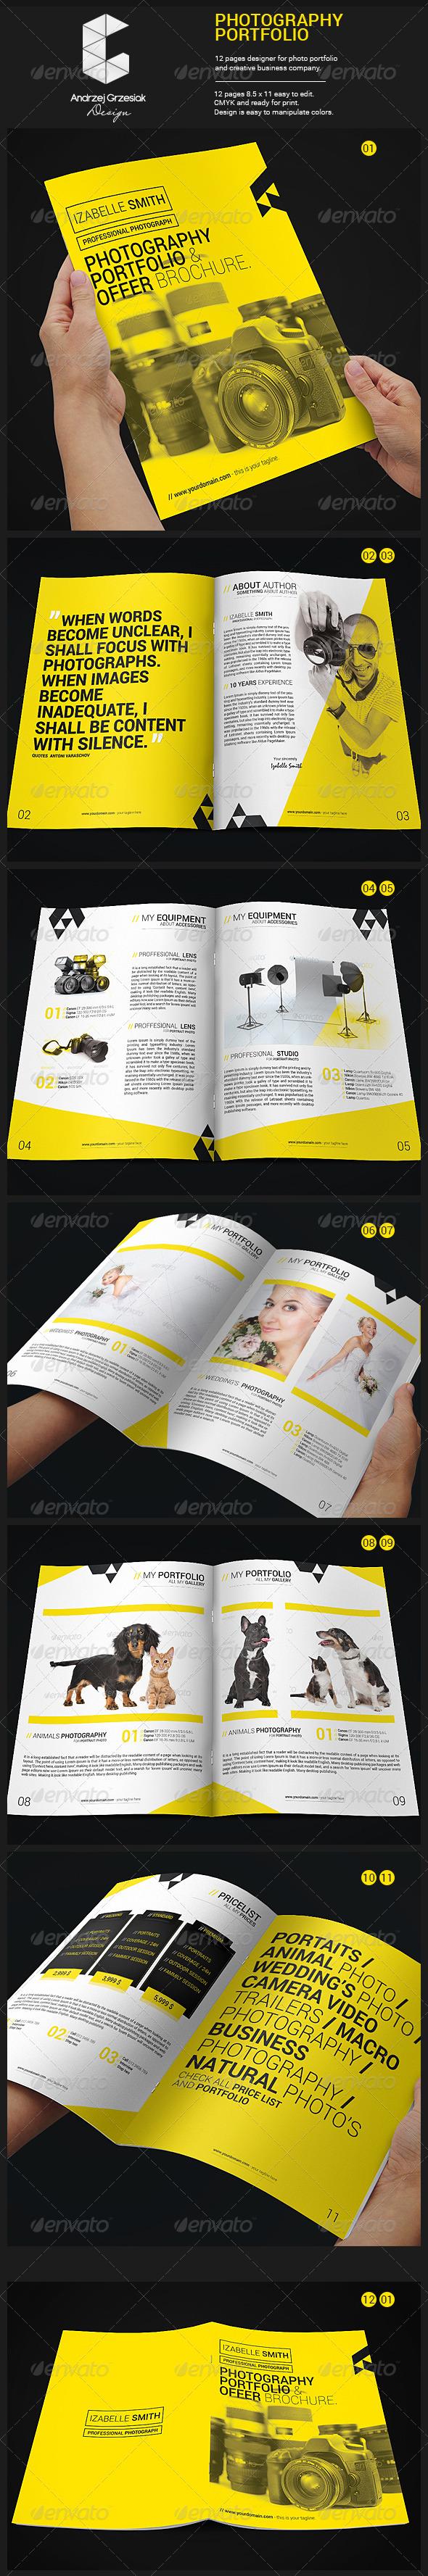 GraphicRiver Photography Portfolio 6206340